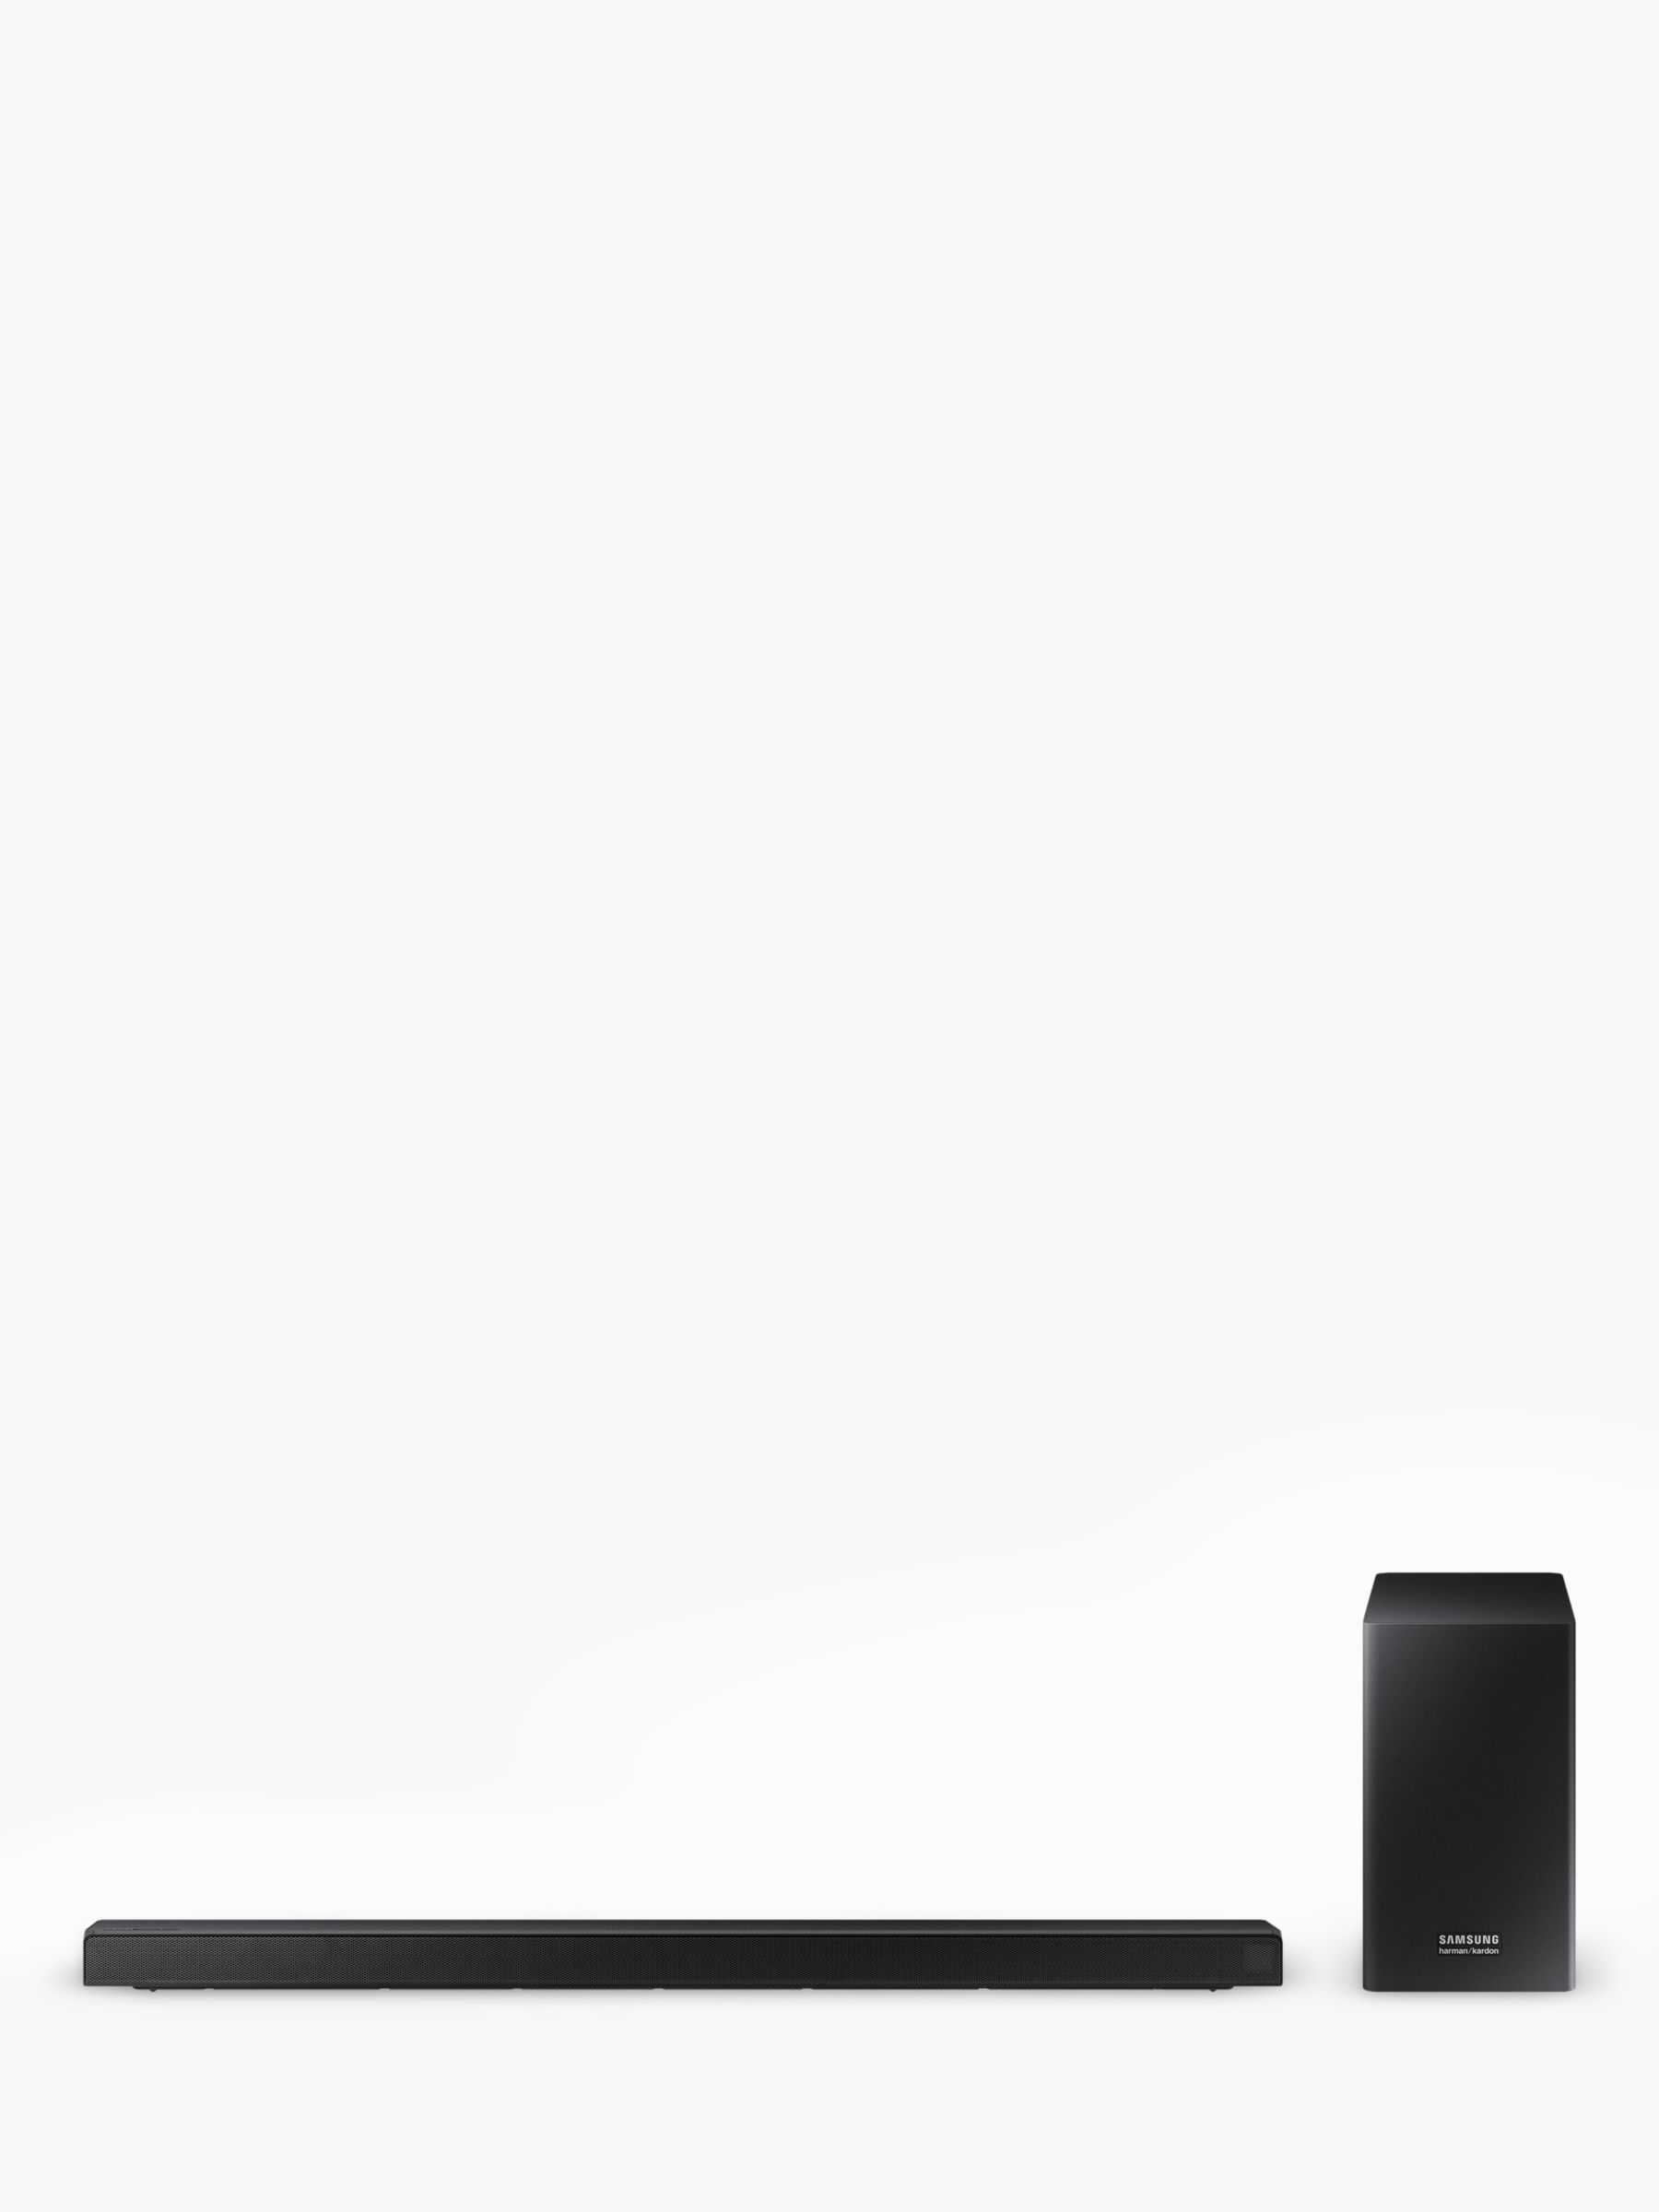 Samsung QE43Q60R (2019) QLED HDR 4K Ultra HD Smart TV, 43